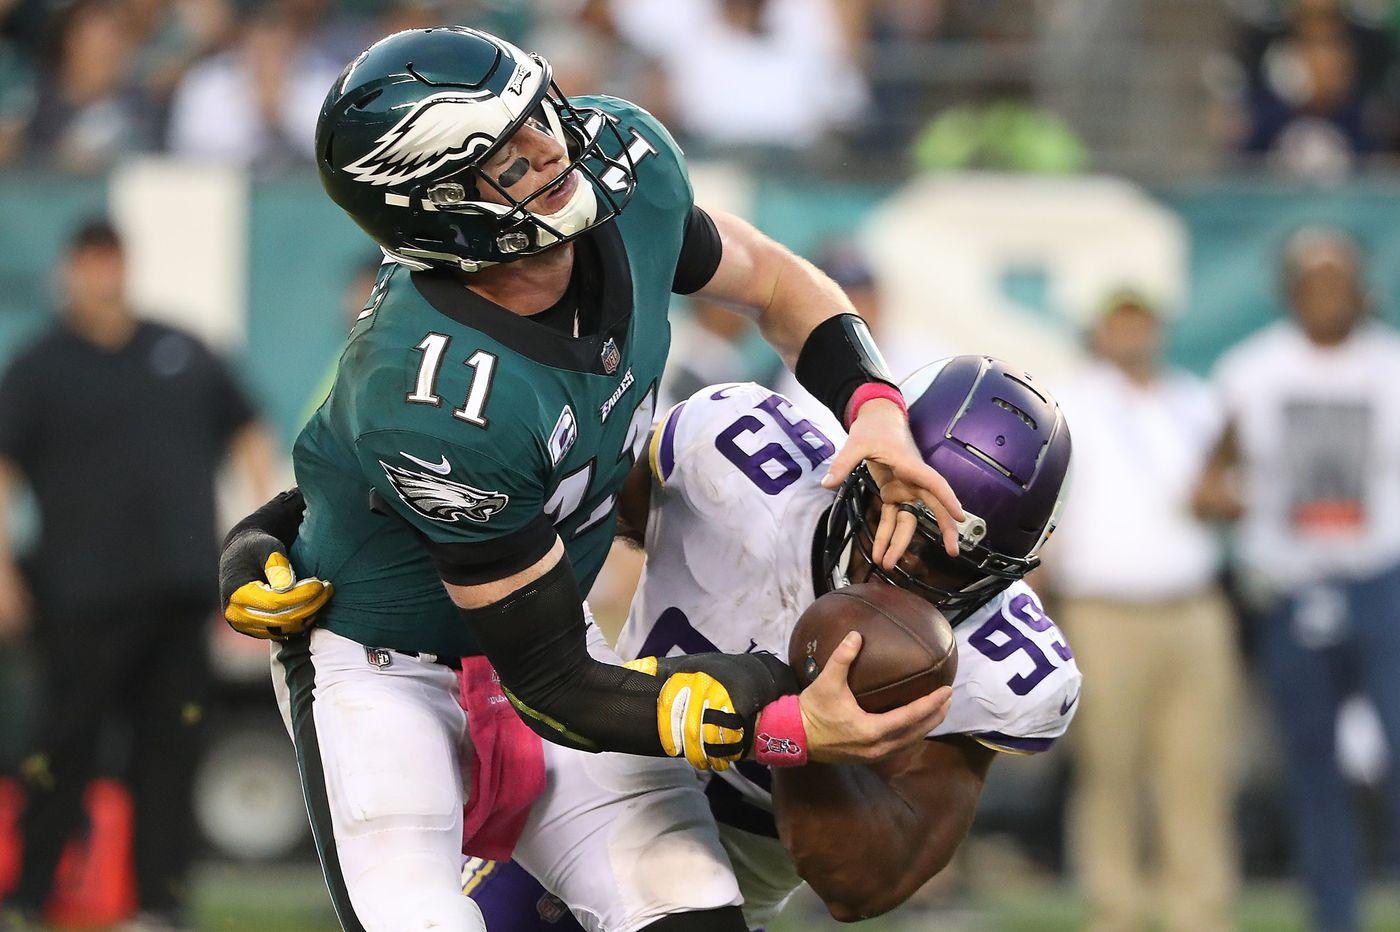 Vikings 23, Eagles 21: Penalties, turnovers plague Birds in rare home loss